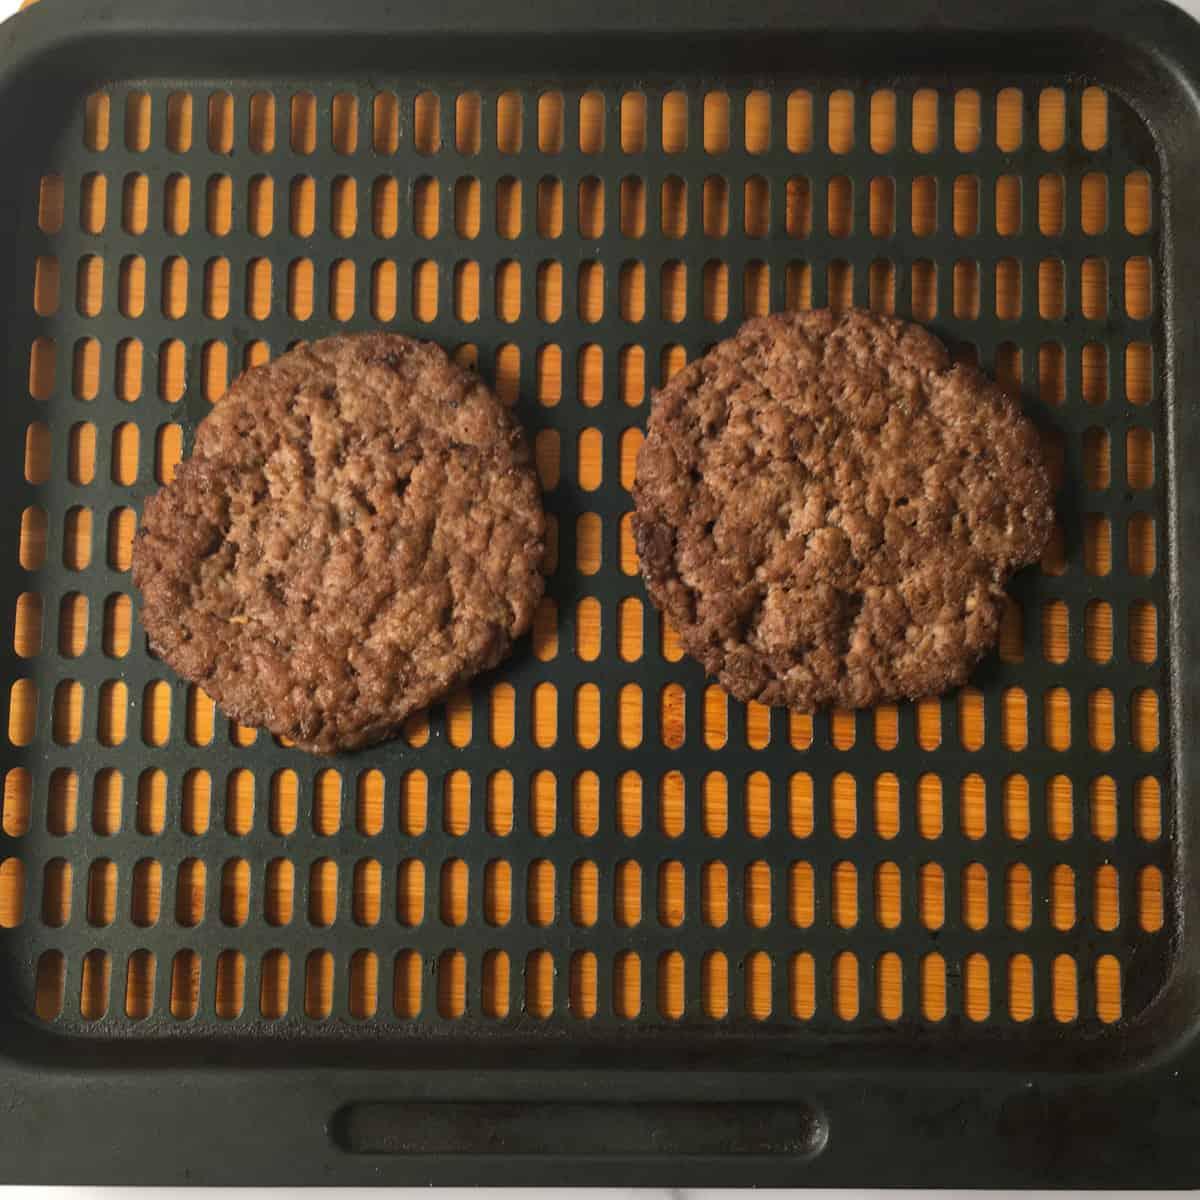 reheat mcdonalds hamburgers air fryer